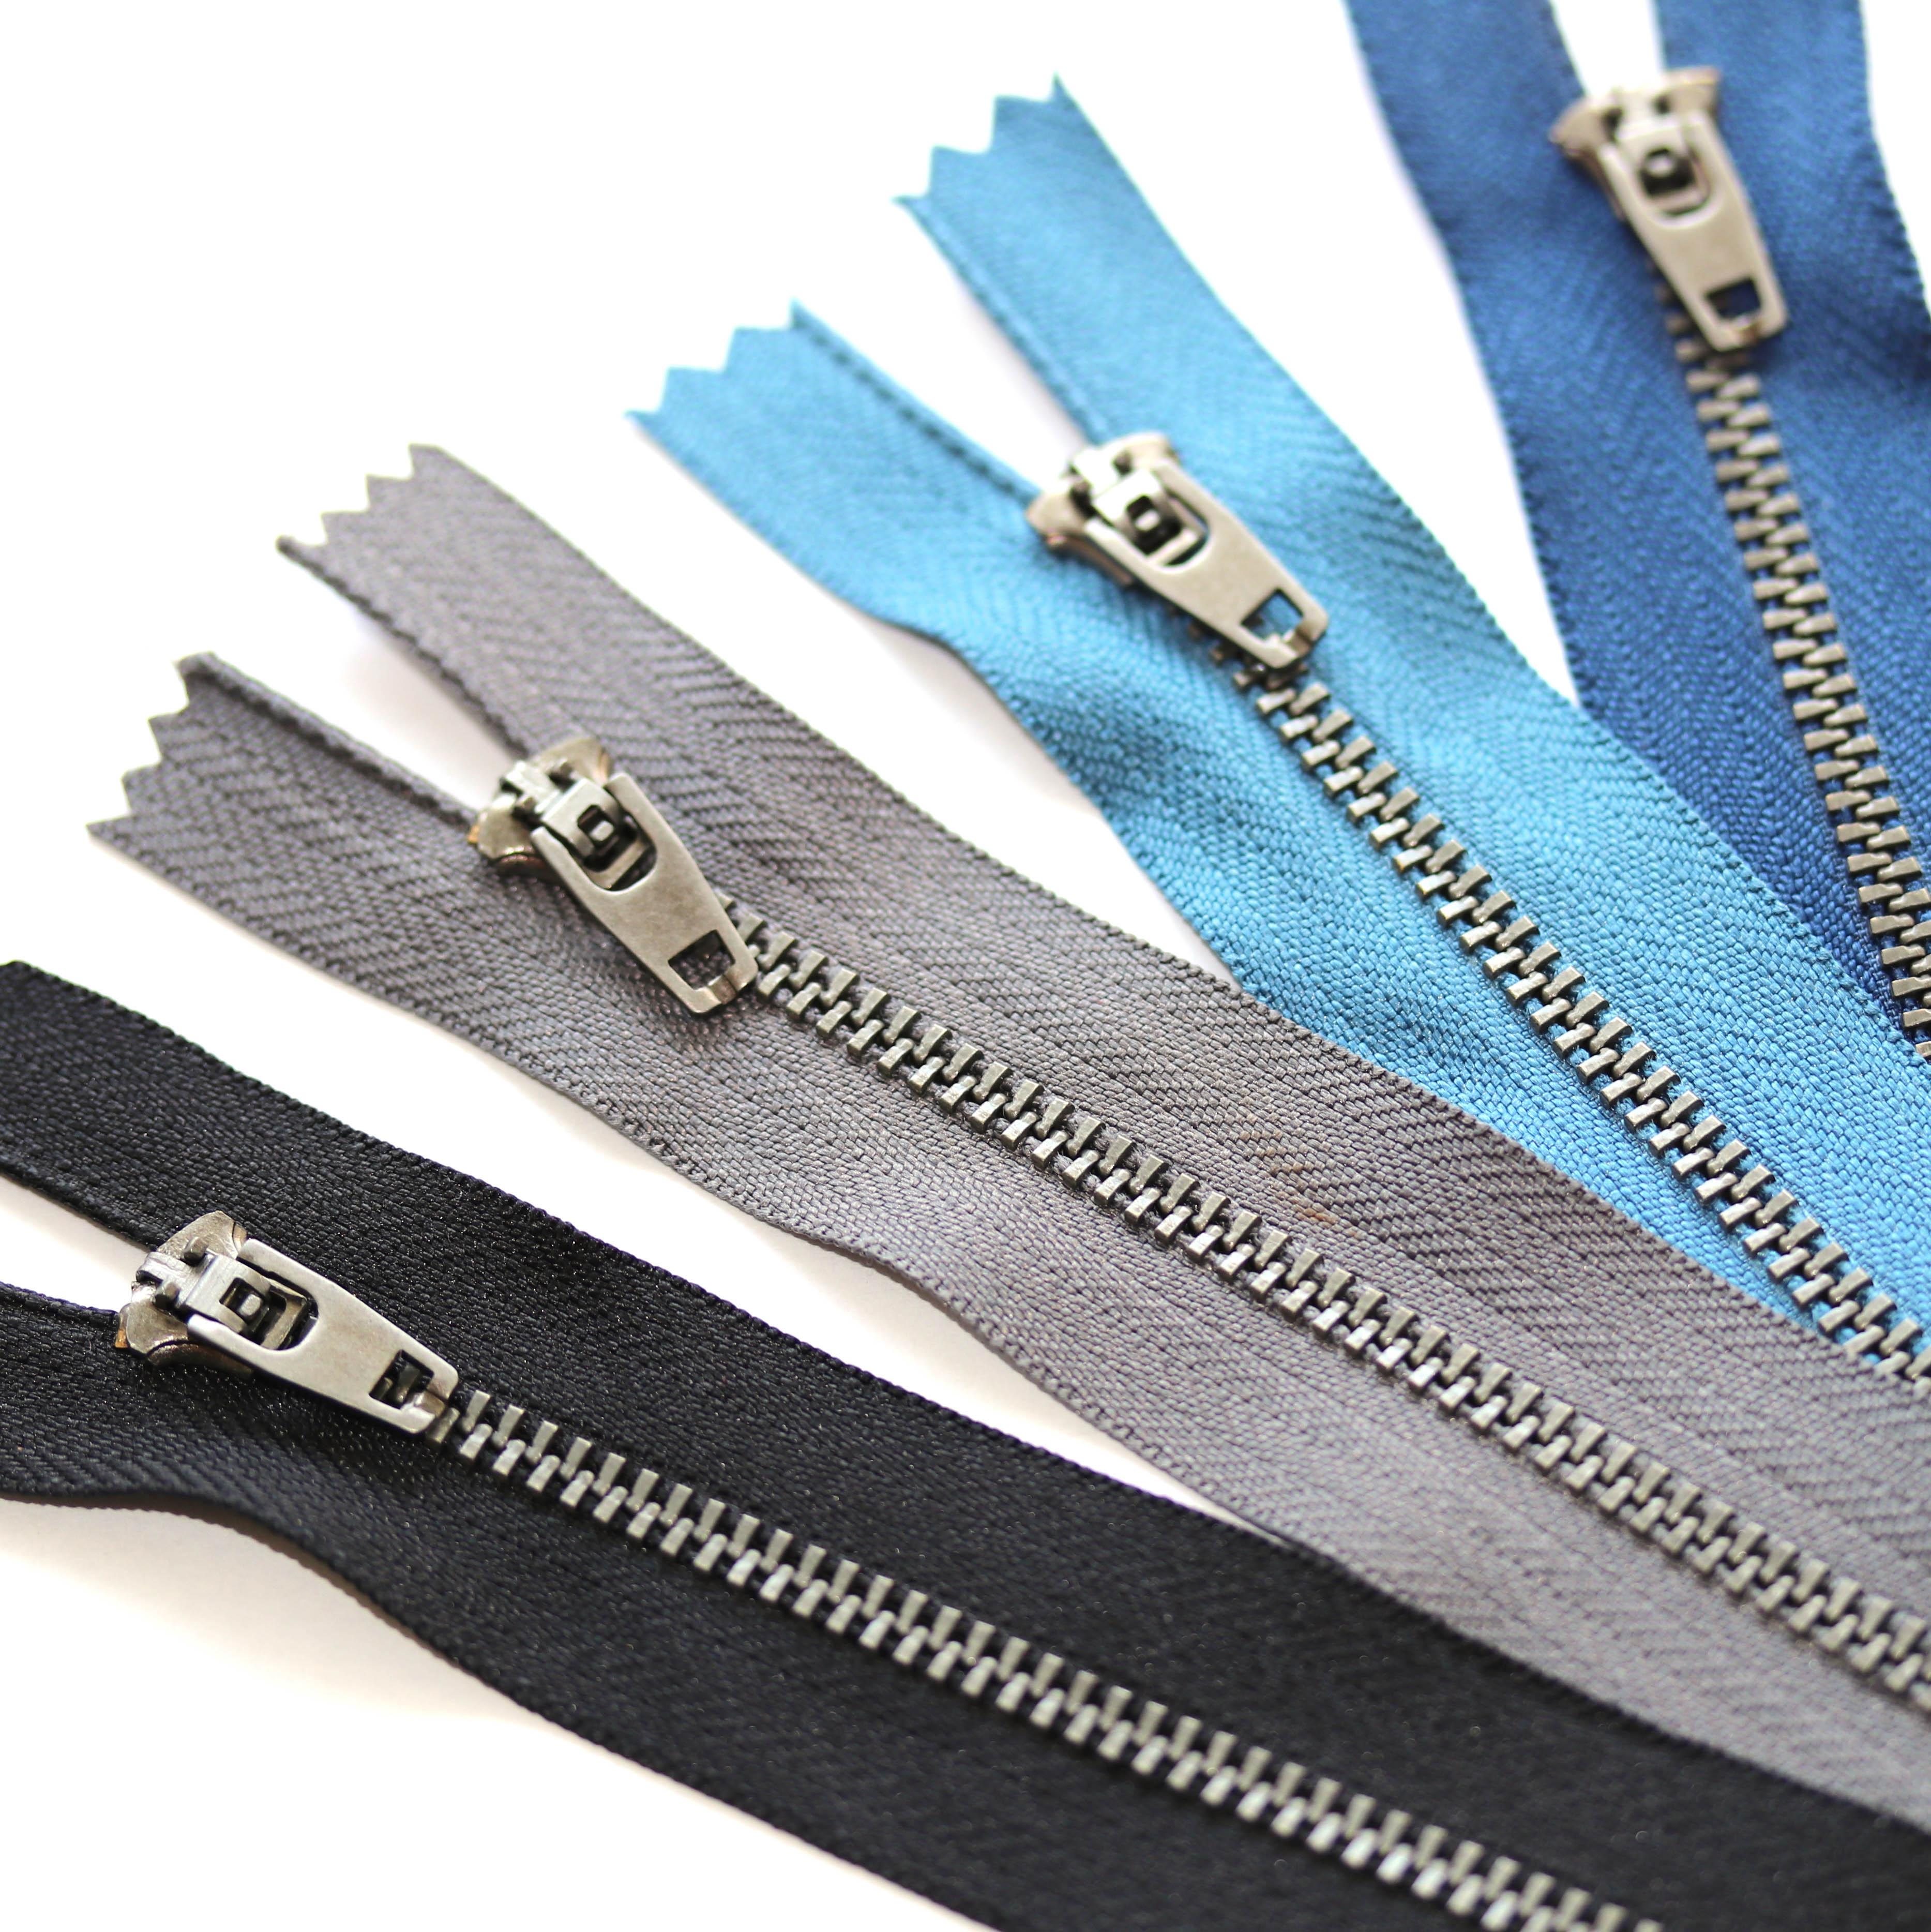 Metall Reißverschluss 4mm nicht teilbar Zipper für Jeans Taschen Geldbörse Hosen